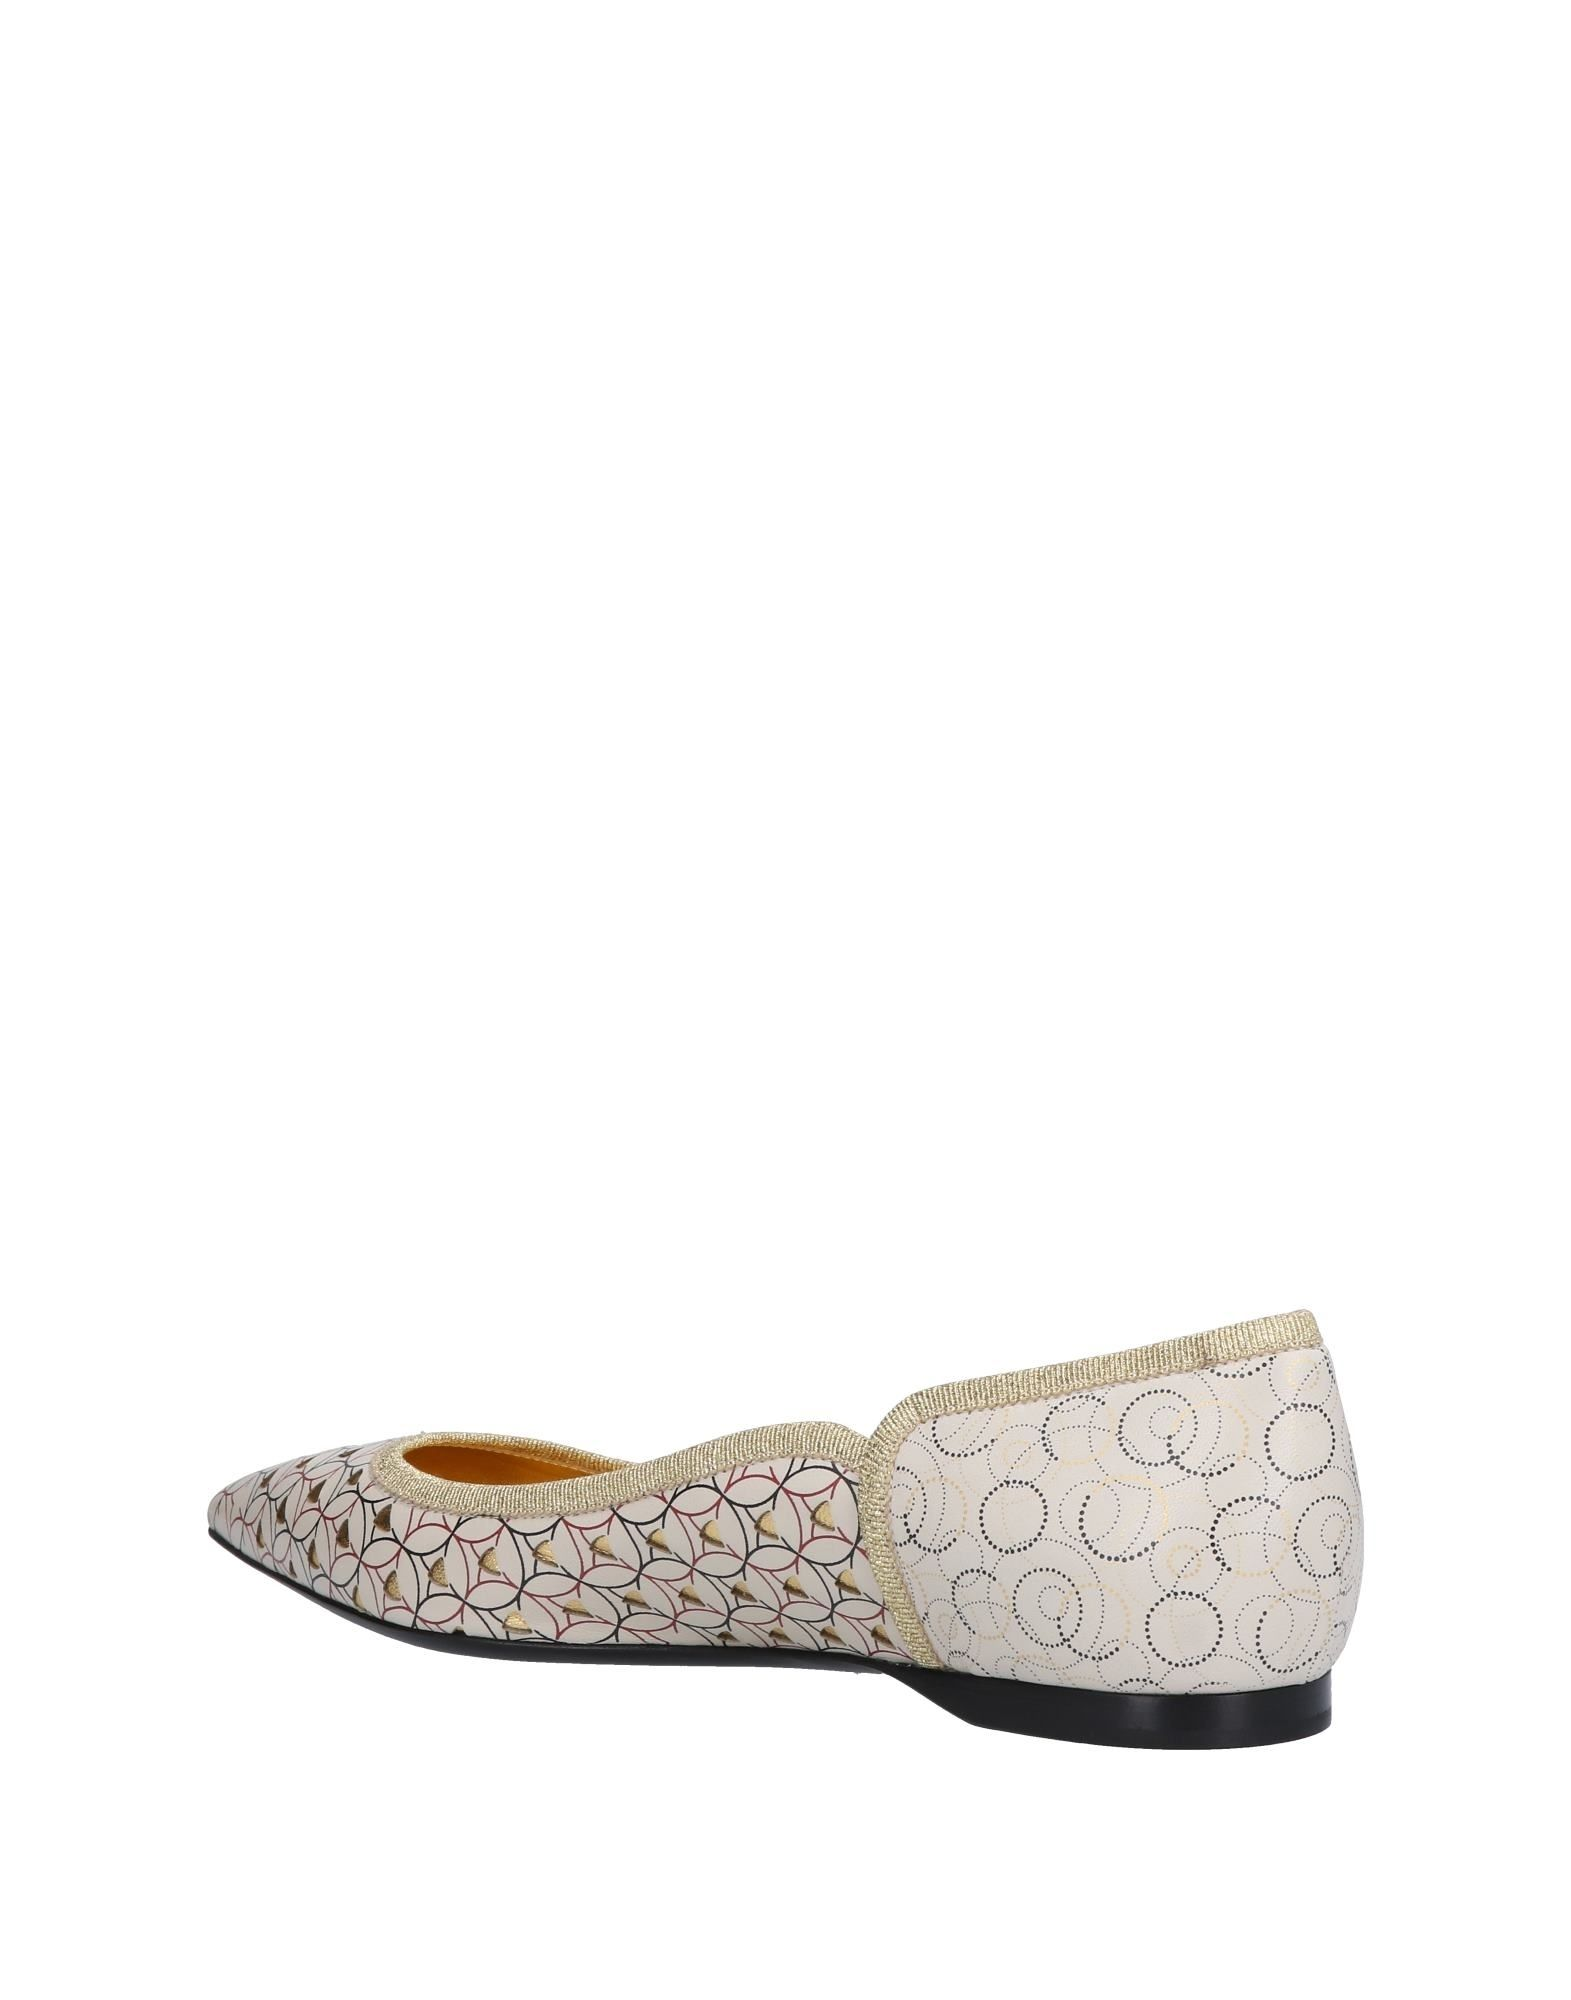 Bottega Veneta 11485048ORGünstige Ballerinas Damen  11485048ORGünstige Veneta gut aussehende Schuhe 796342